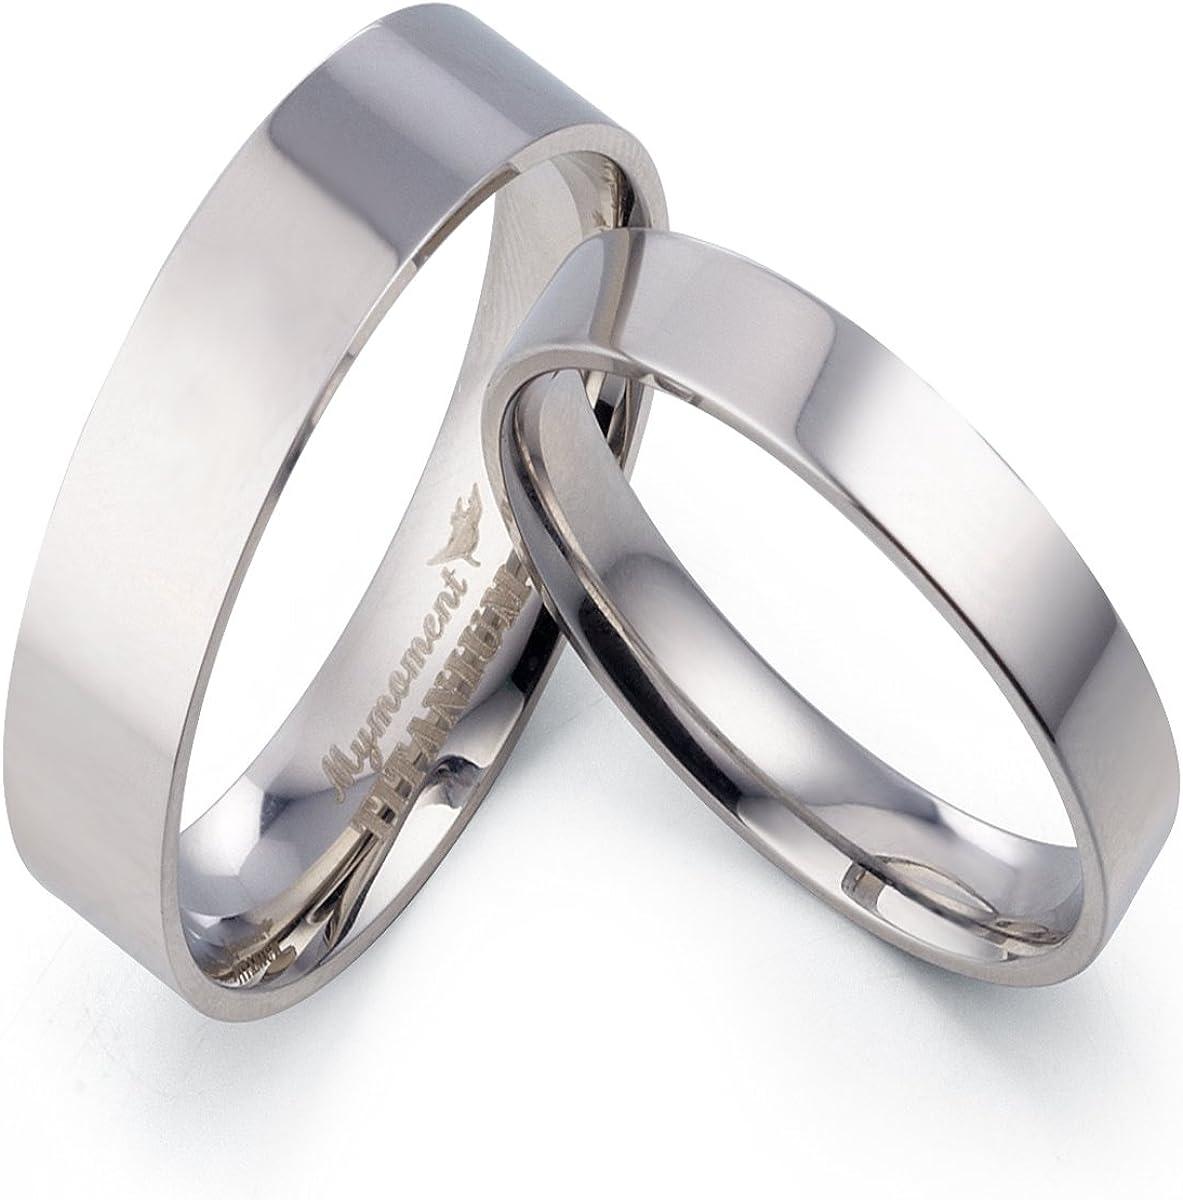 13 Women Ring Size Gemini His /& Her Groom /& Bride Plain Flat Court Comfort Fit Matching Wedding Engagement Titanium Rings Set 6mm /& 4mm Width Men Ring Size 9